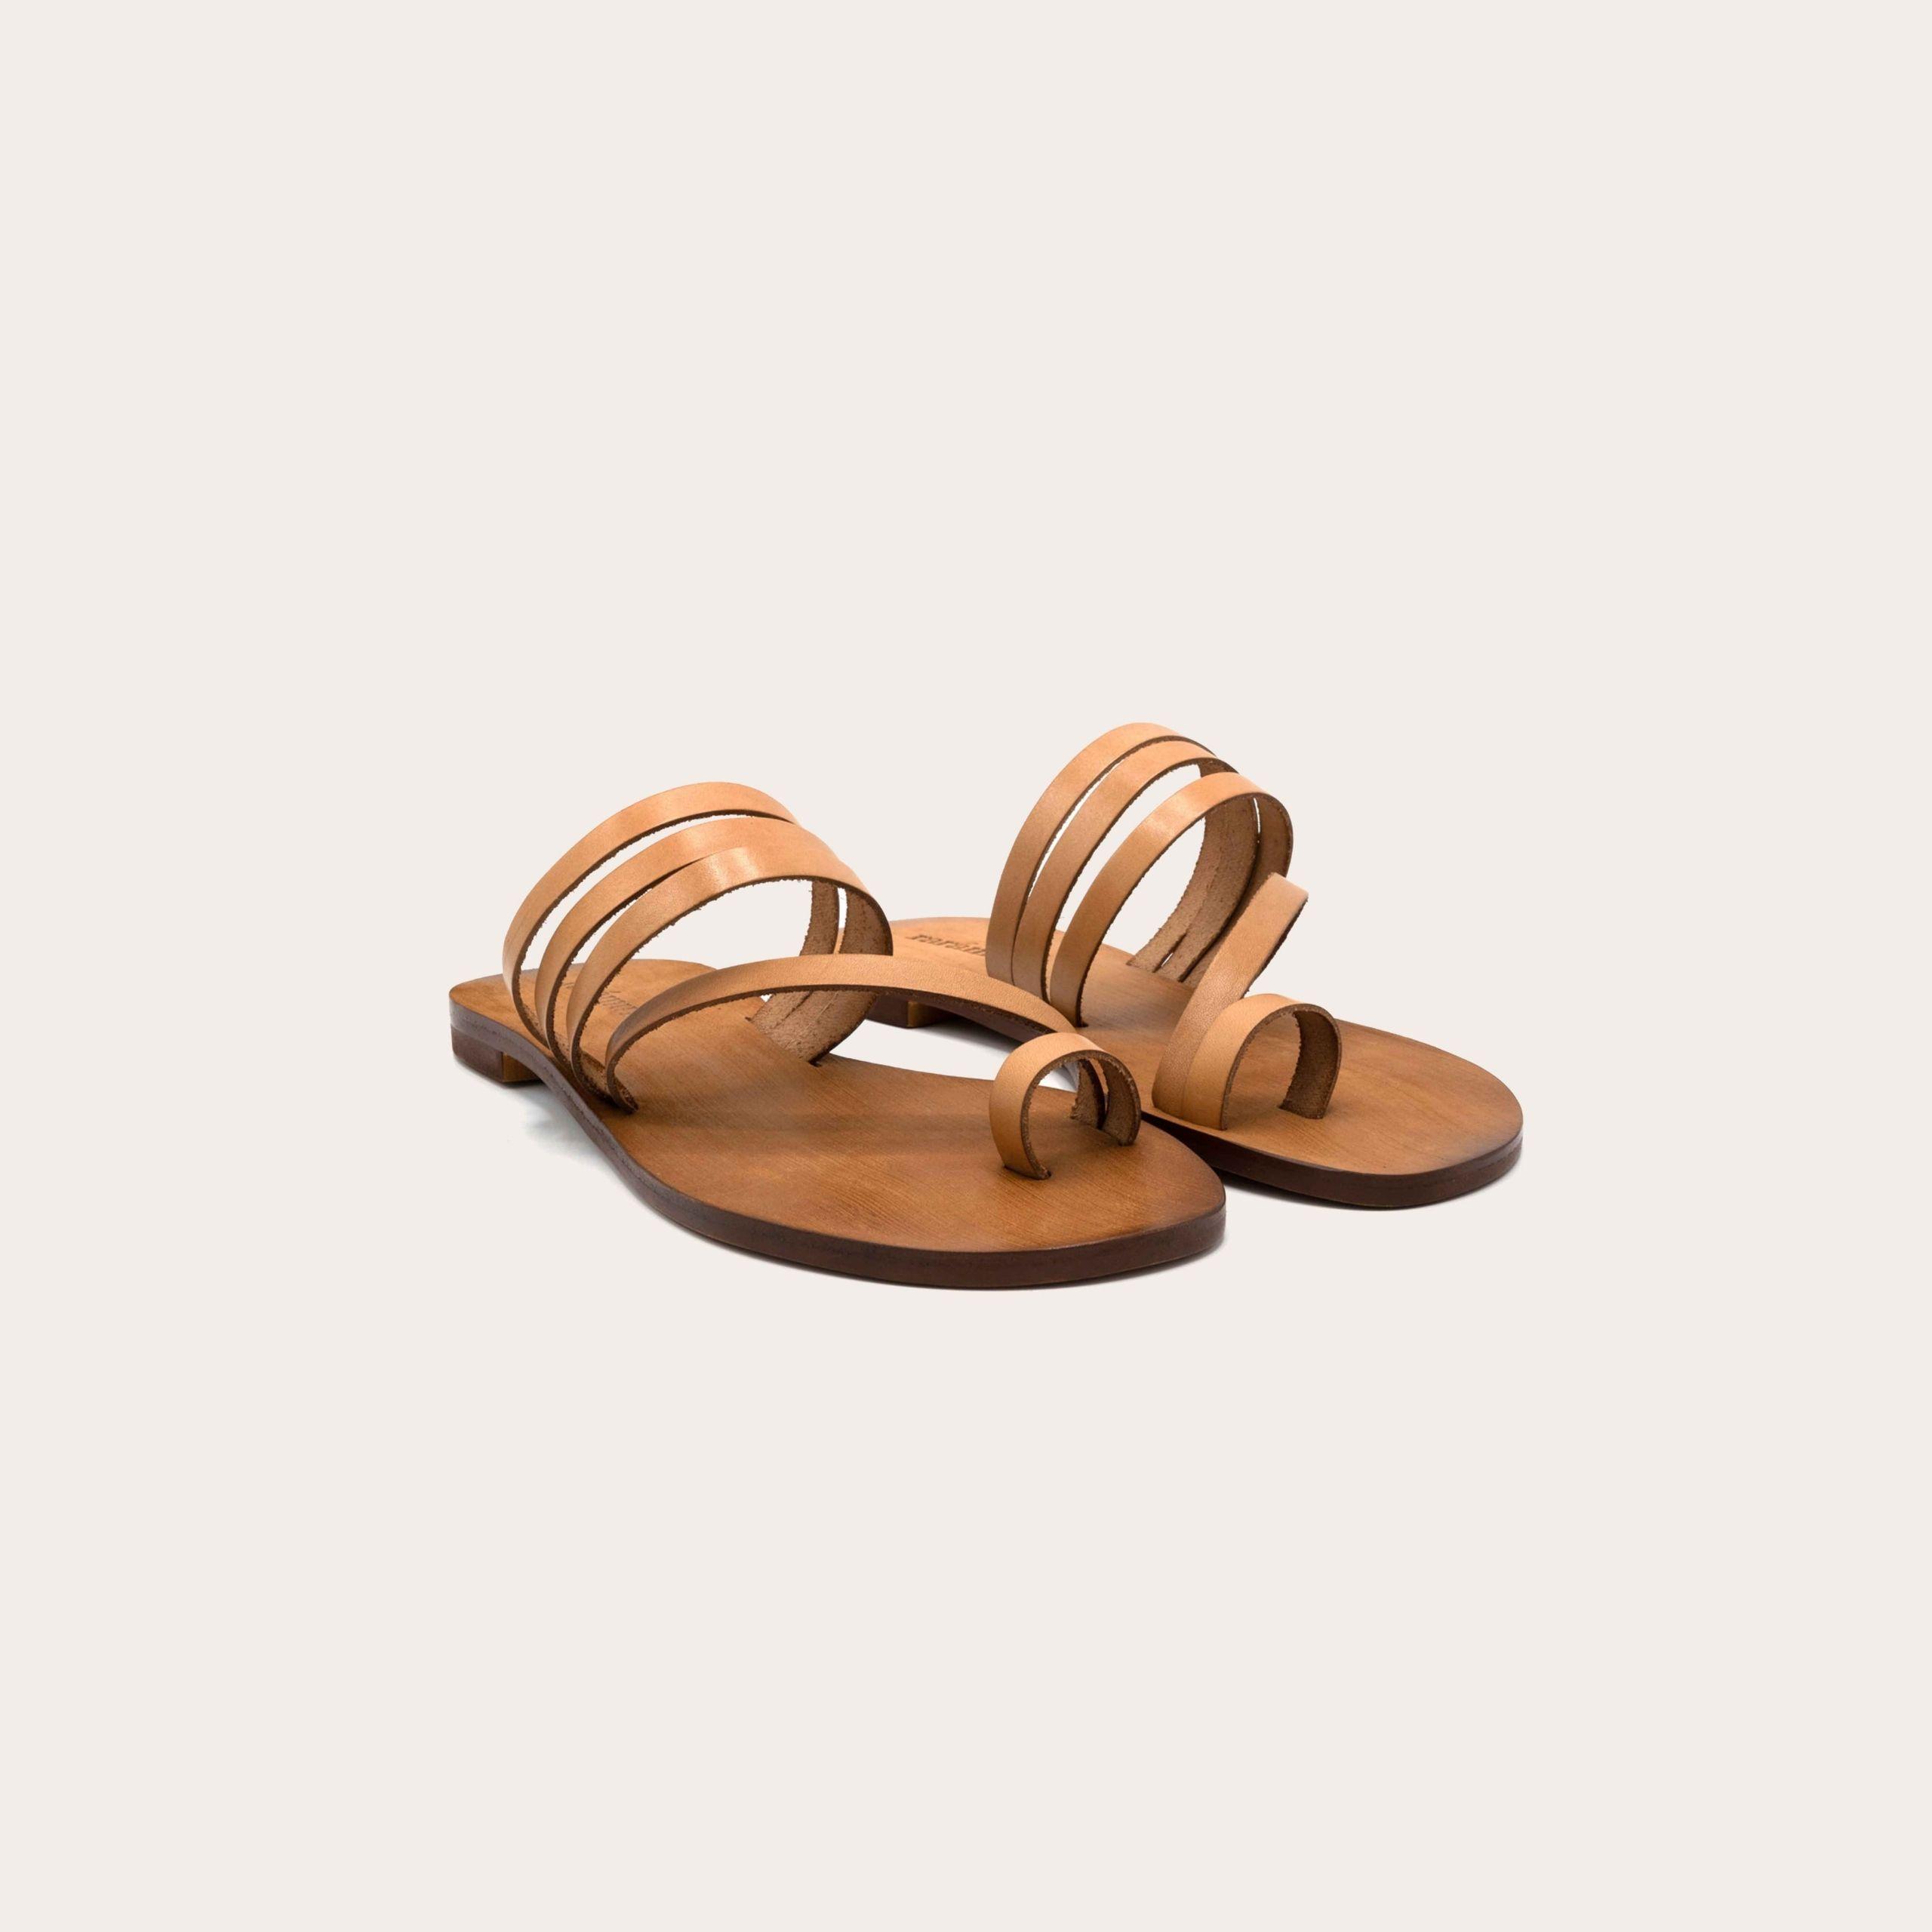 xico-beige_2_lintsandalen sandals travelsandals vegan sustainable sandals wikkelsandalen